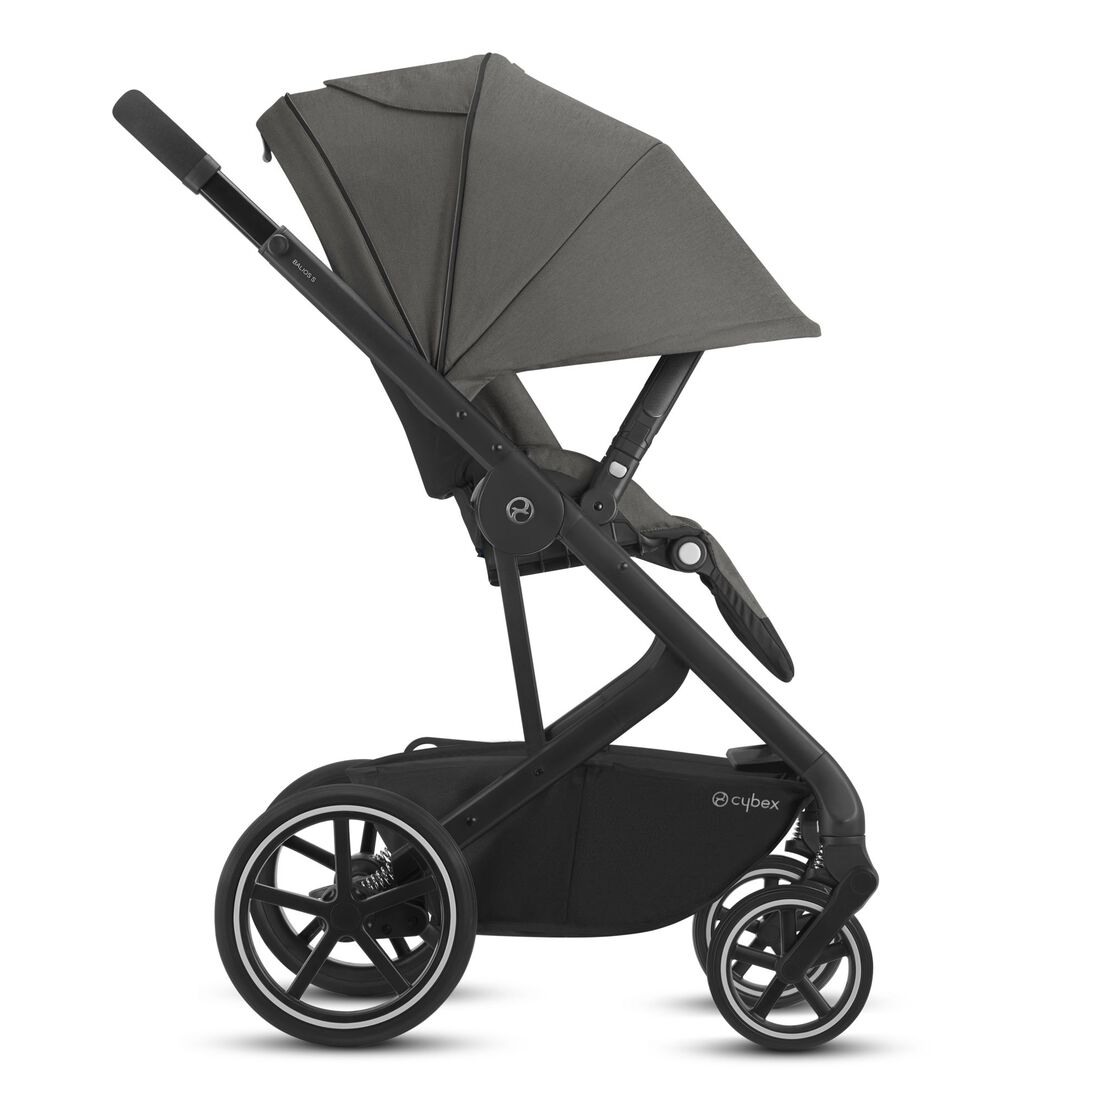 CYBEX Balios S Lux - Soho Grey (Schwarzer Rahmen) in Soho Grey (Black Frame) large Bild 5